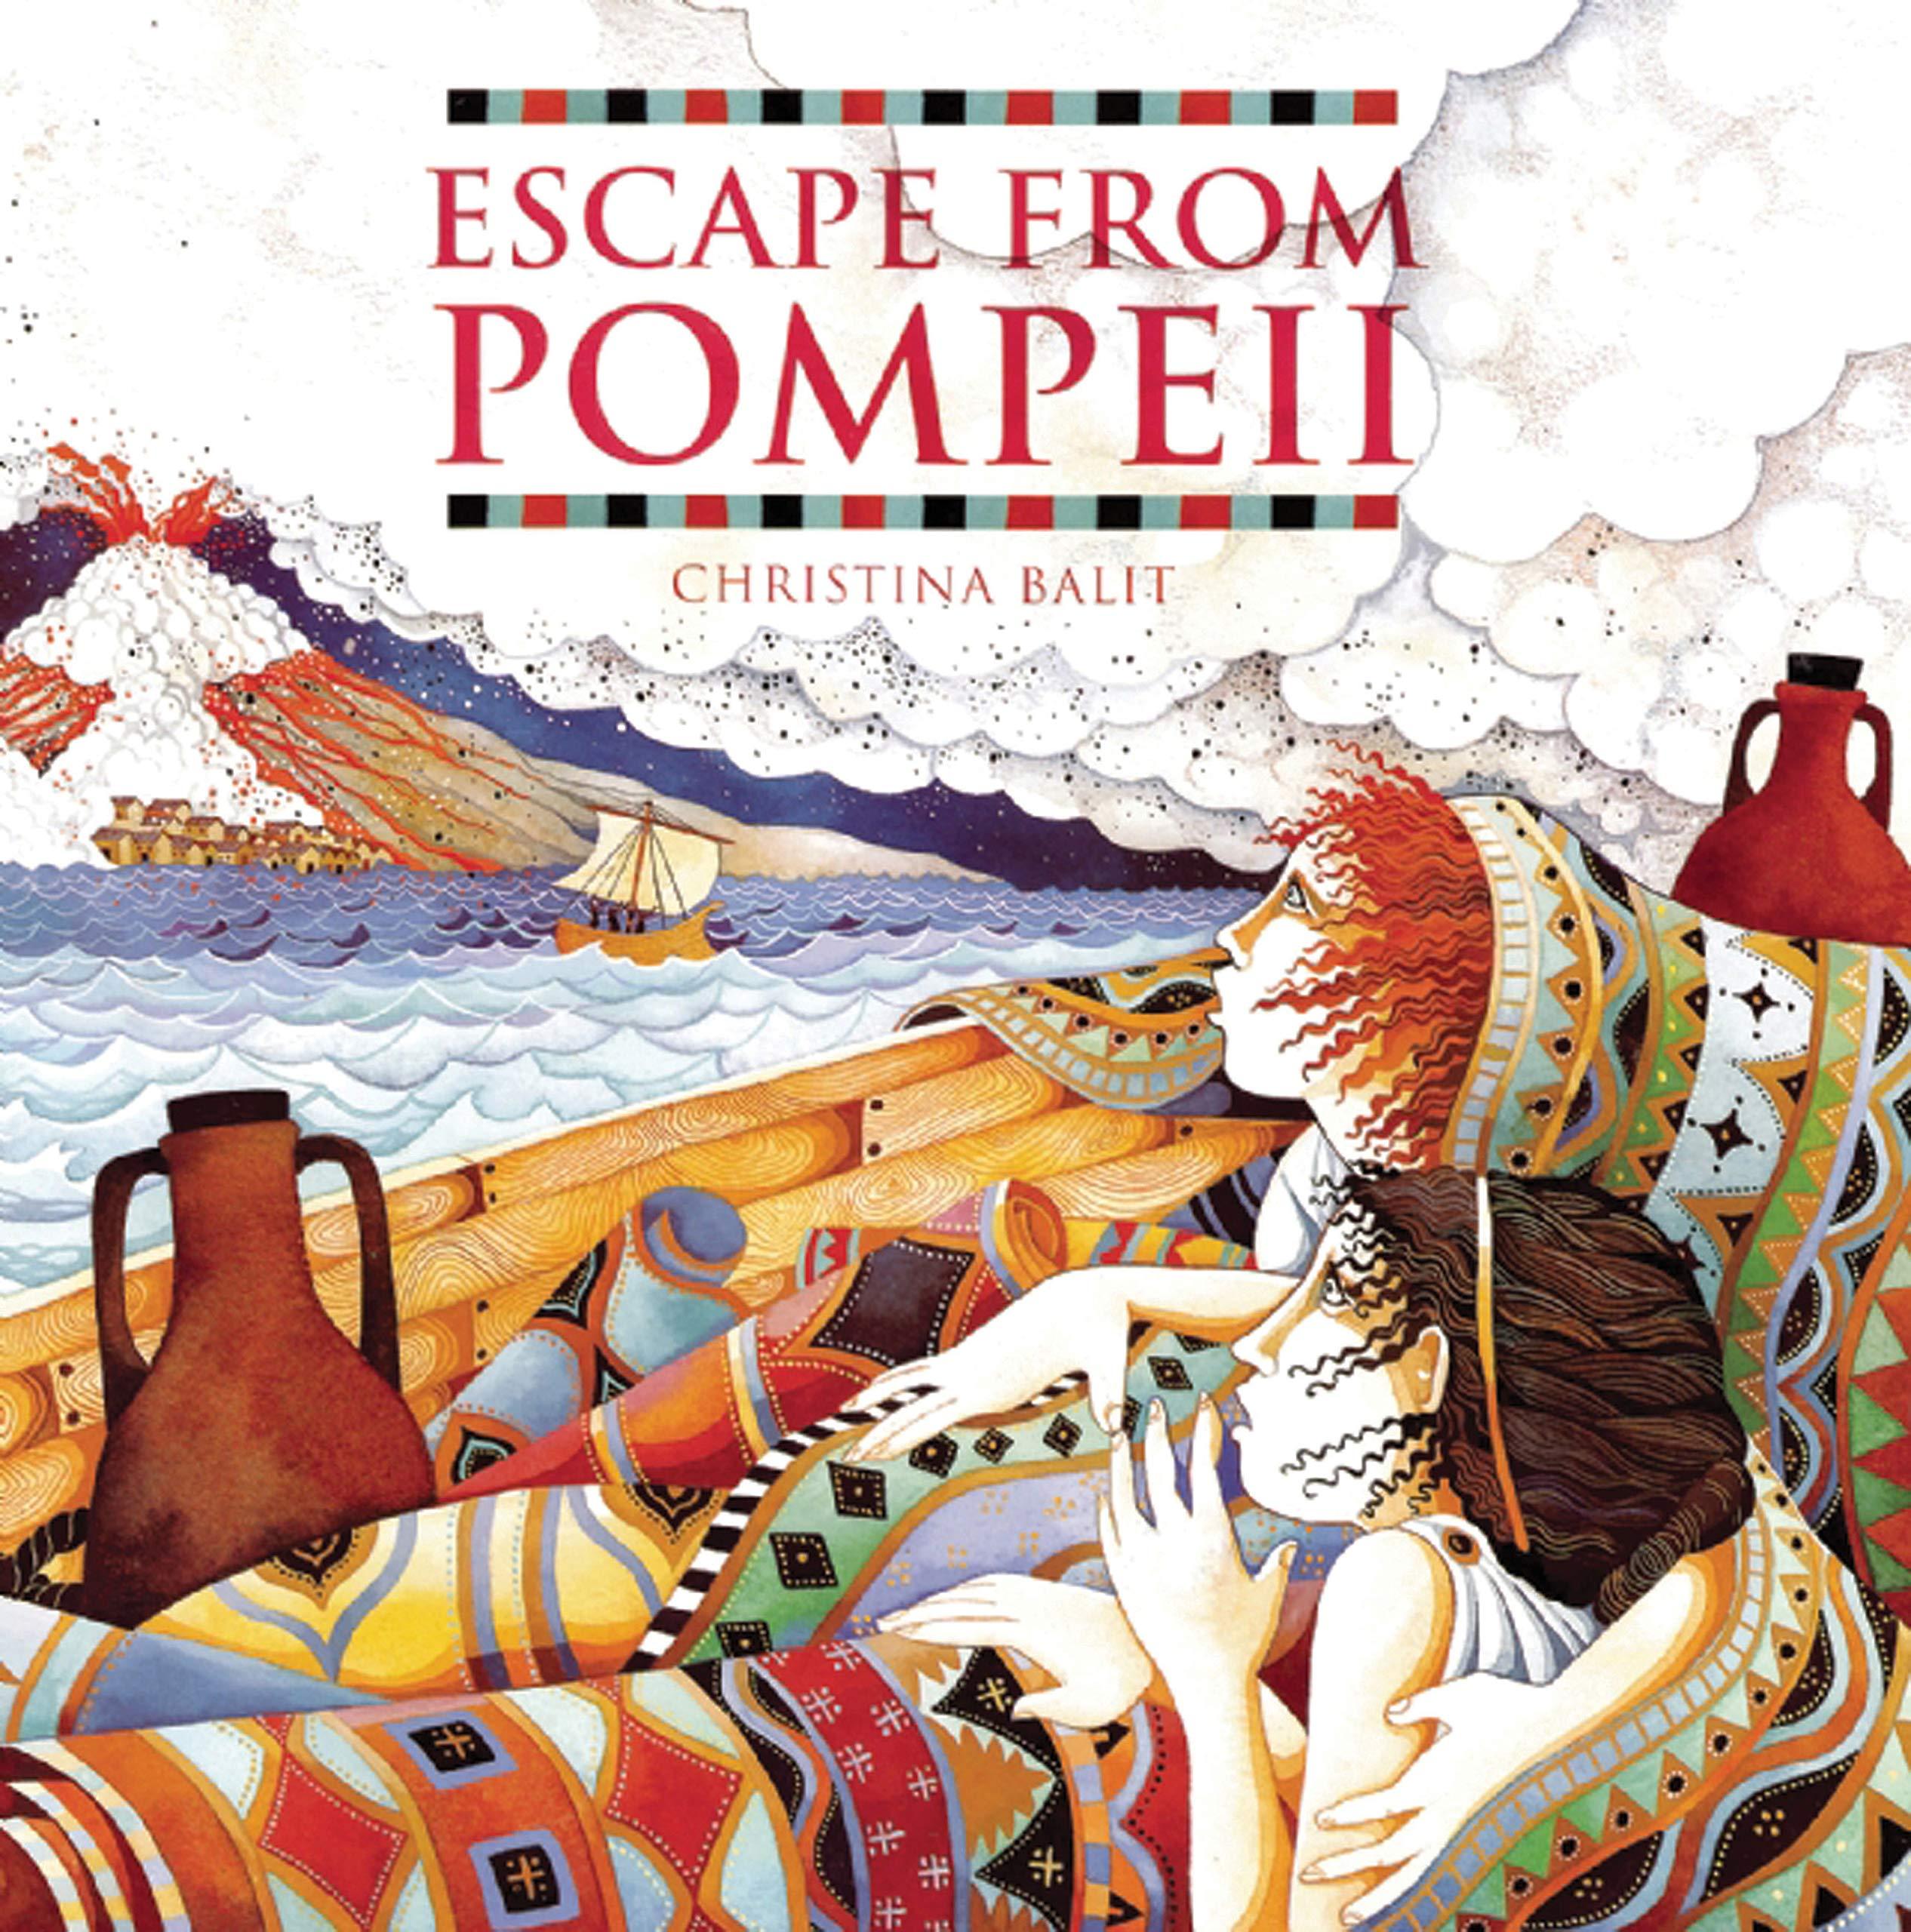 Escape from Pompeii: Amazon.co.uk: Balit, Christina: Books